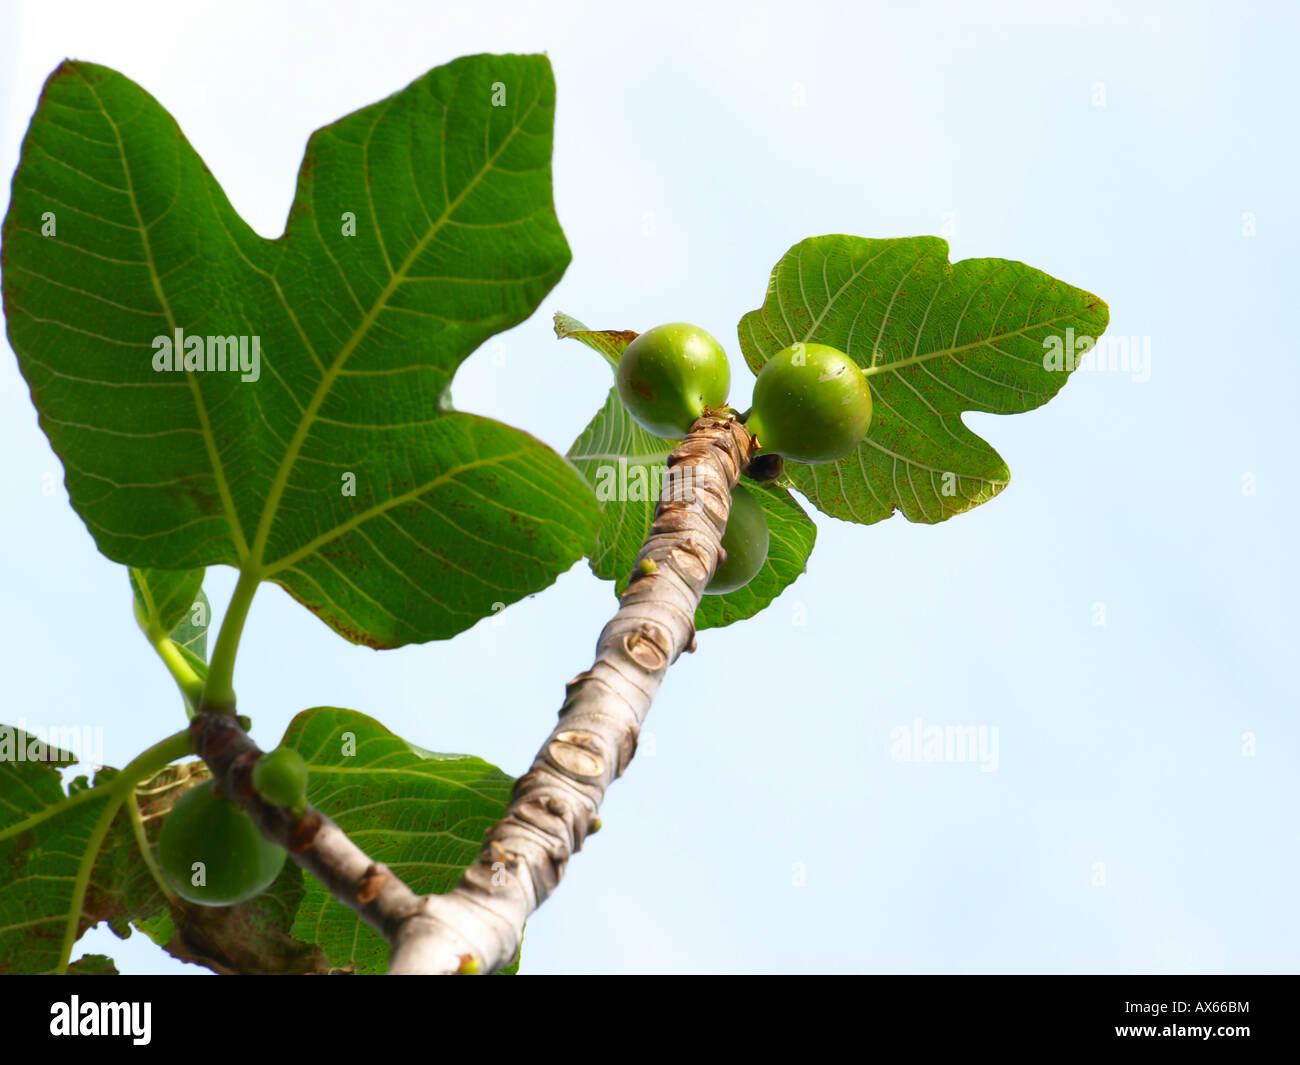 fig fruit tree - Stock Image